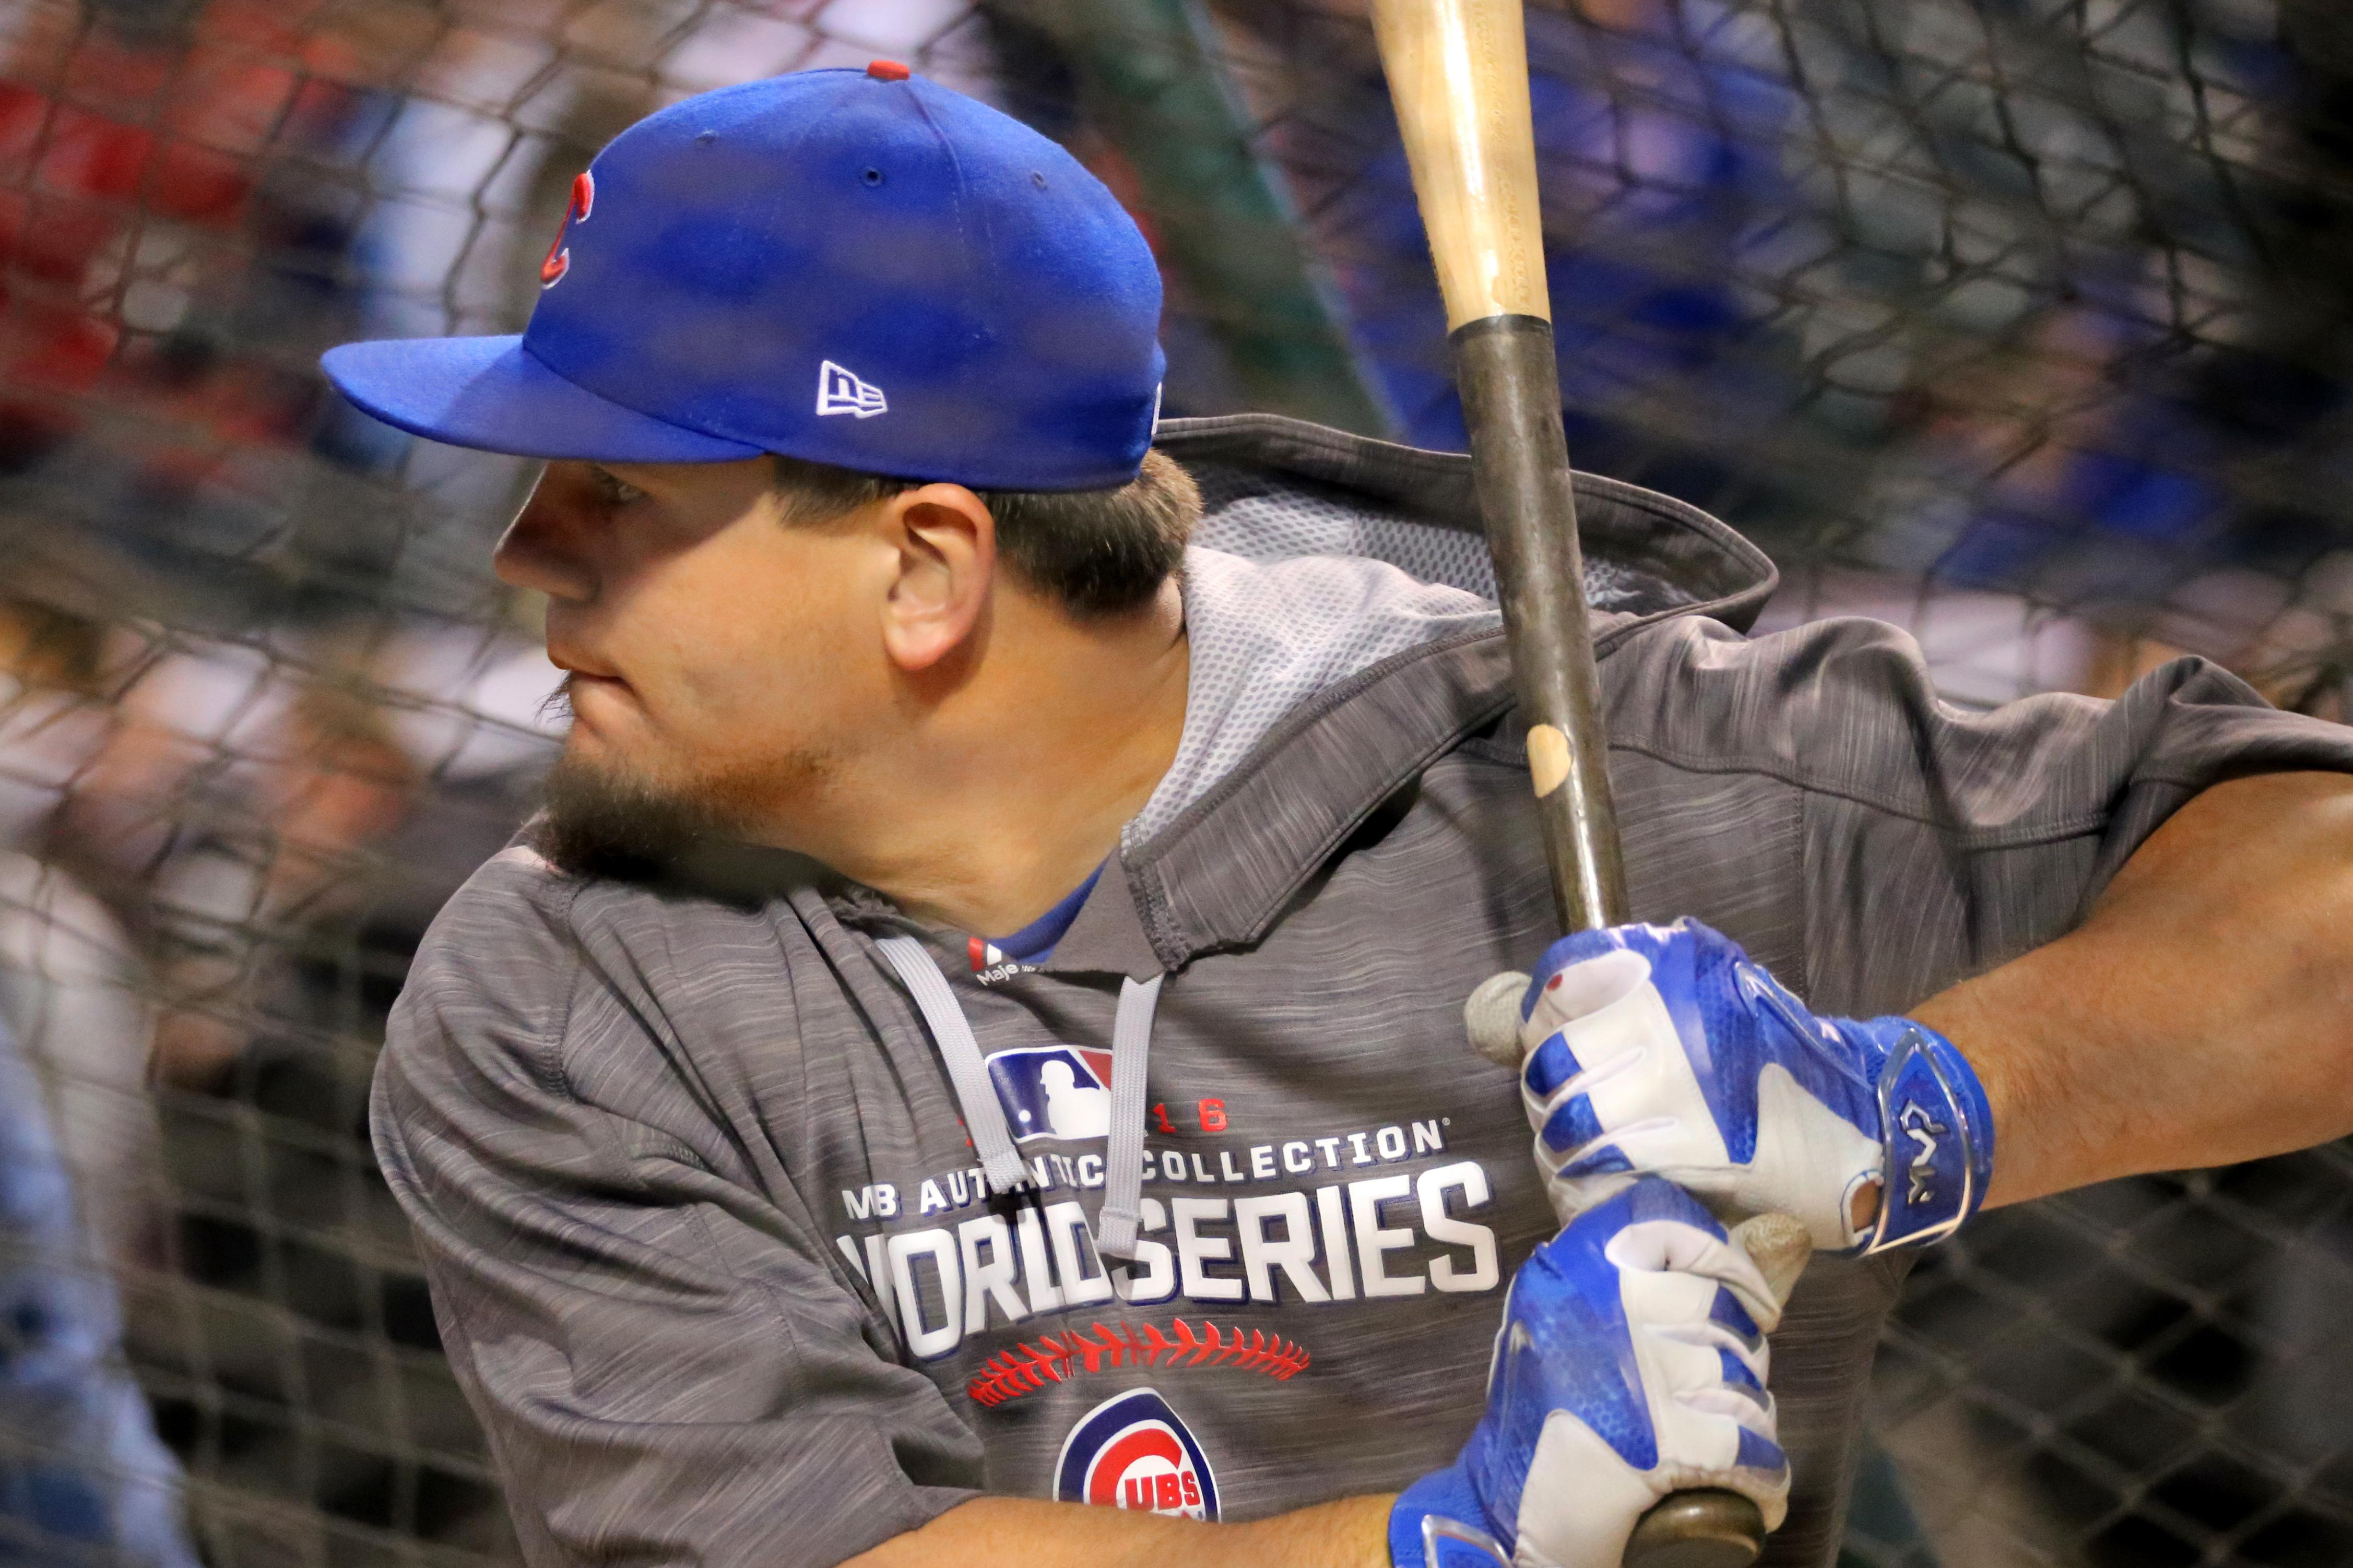 Cubs slugger Kyle Schwarber takes batting practice before WorldSeries Game 1.